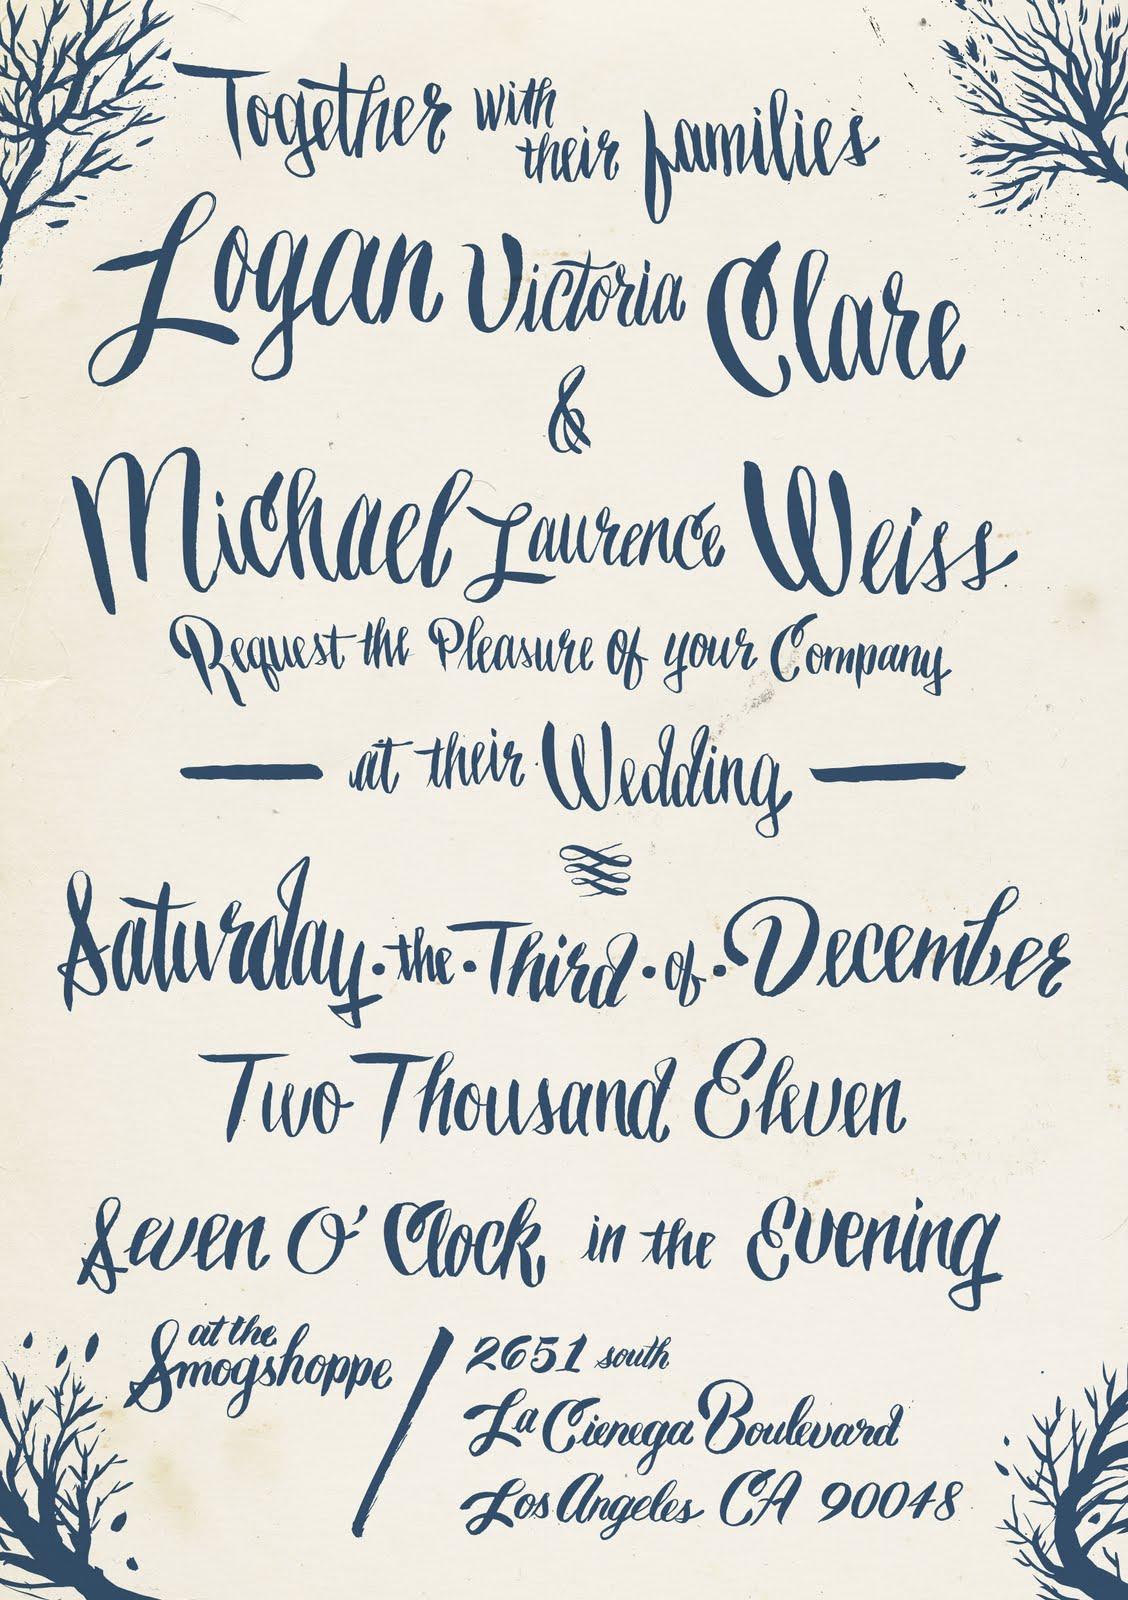 free handwriting fonts for diy wedding invitations handwritten wedding invitations 18 Free Handwriting Fonts for Your DIY Wedding Invitations